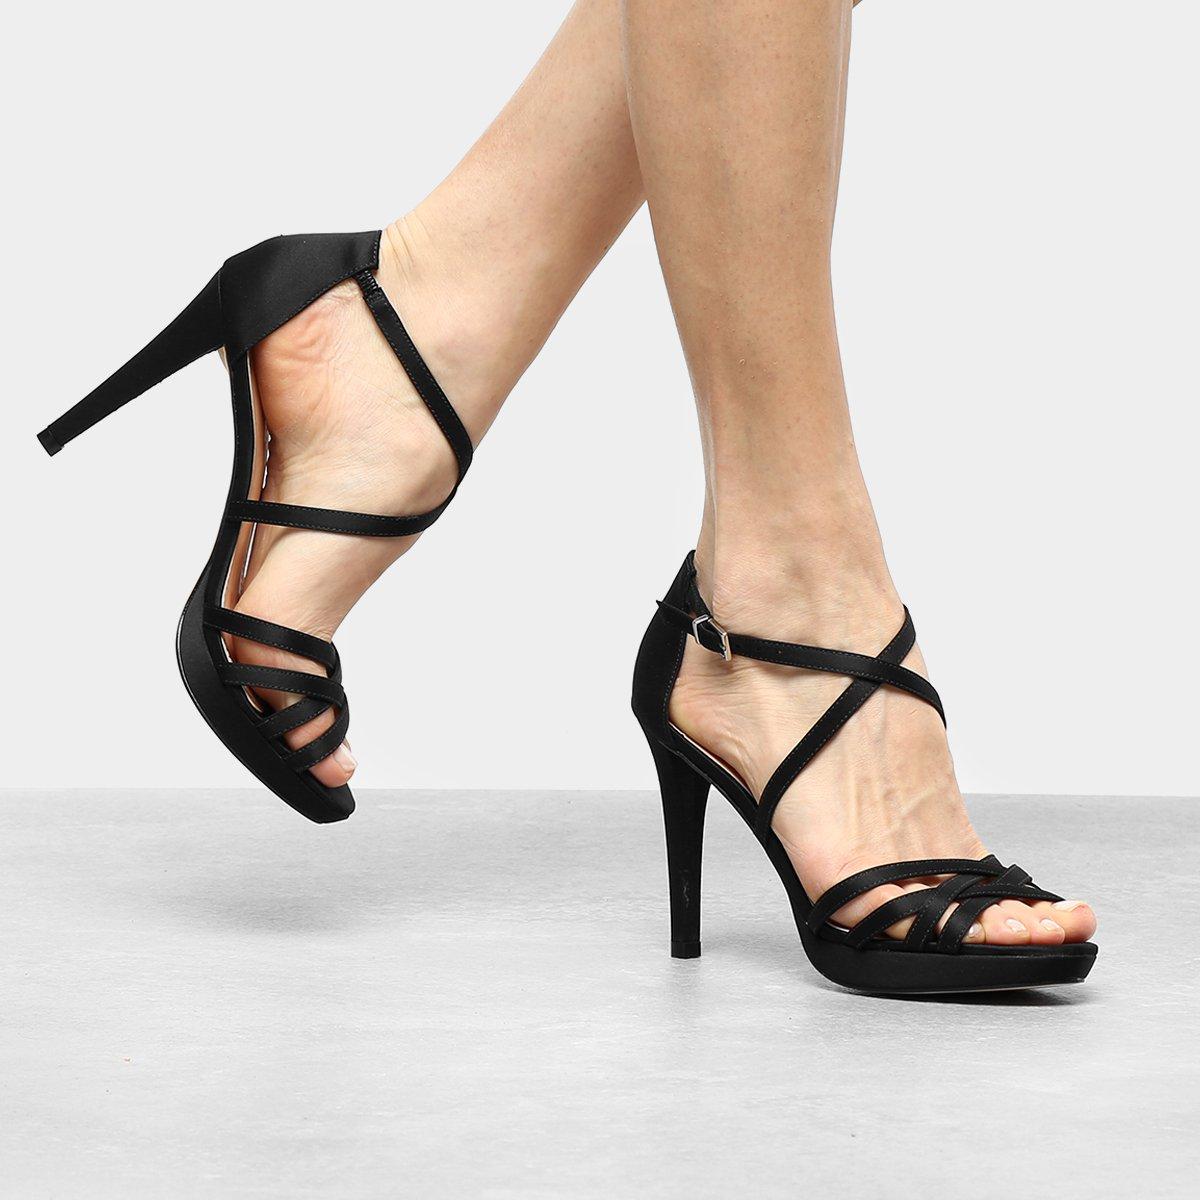 Sandália Shoestock Salto Fino Recortes Feminina - Preto